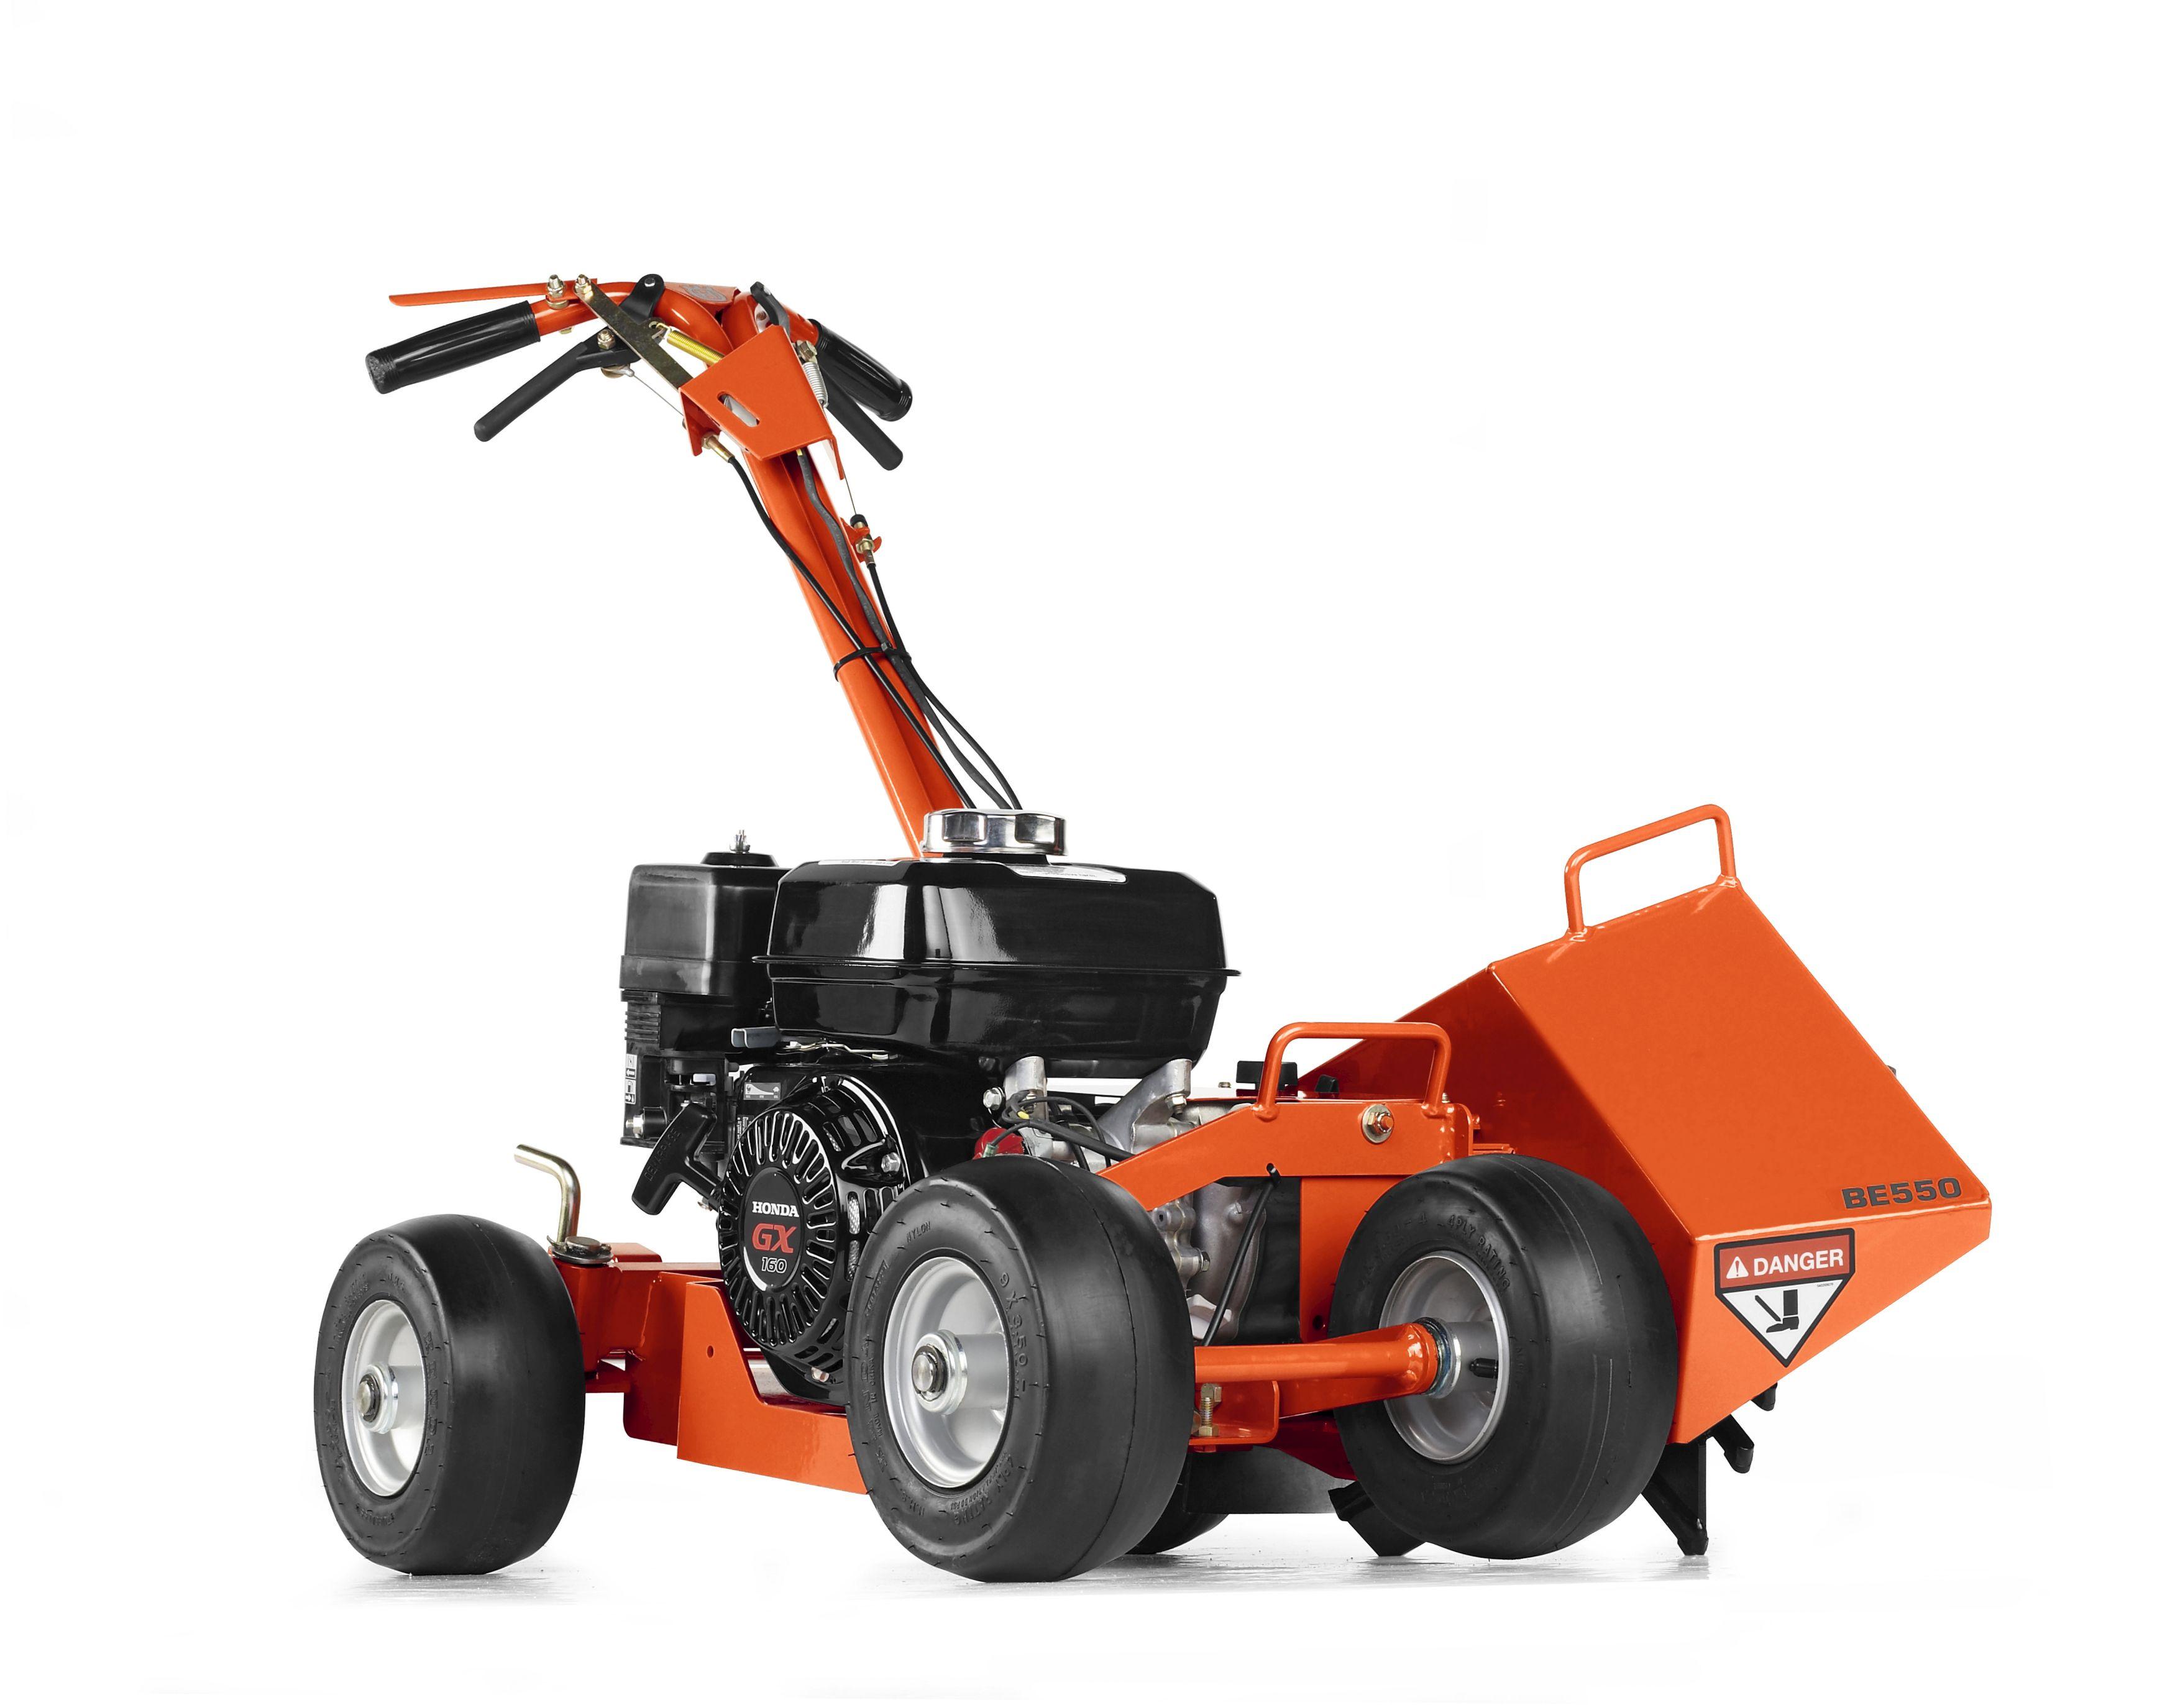 Husqvarna Edger Model BE550 Parts